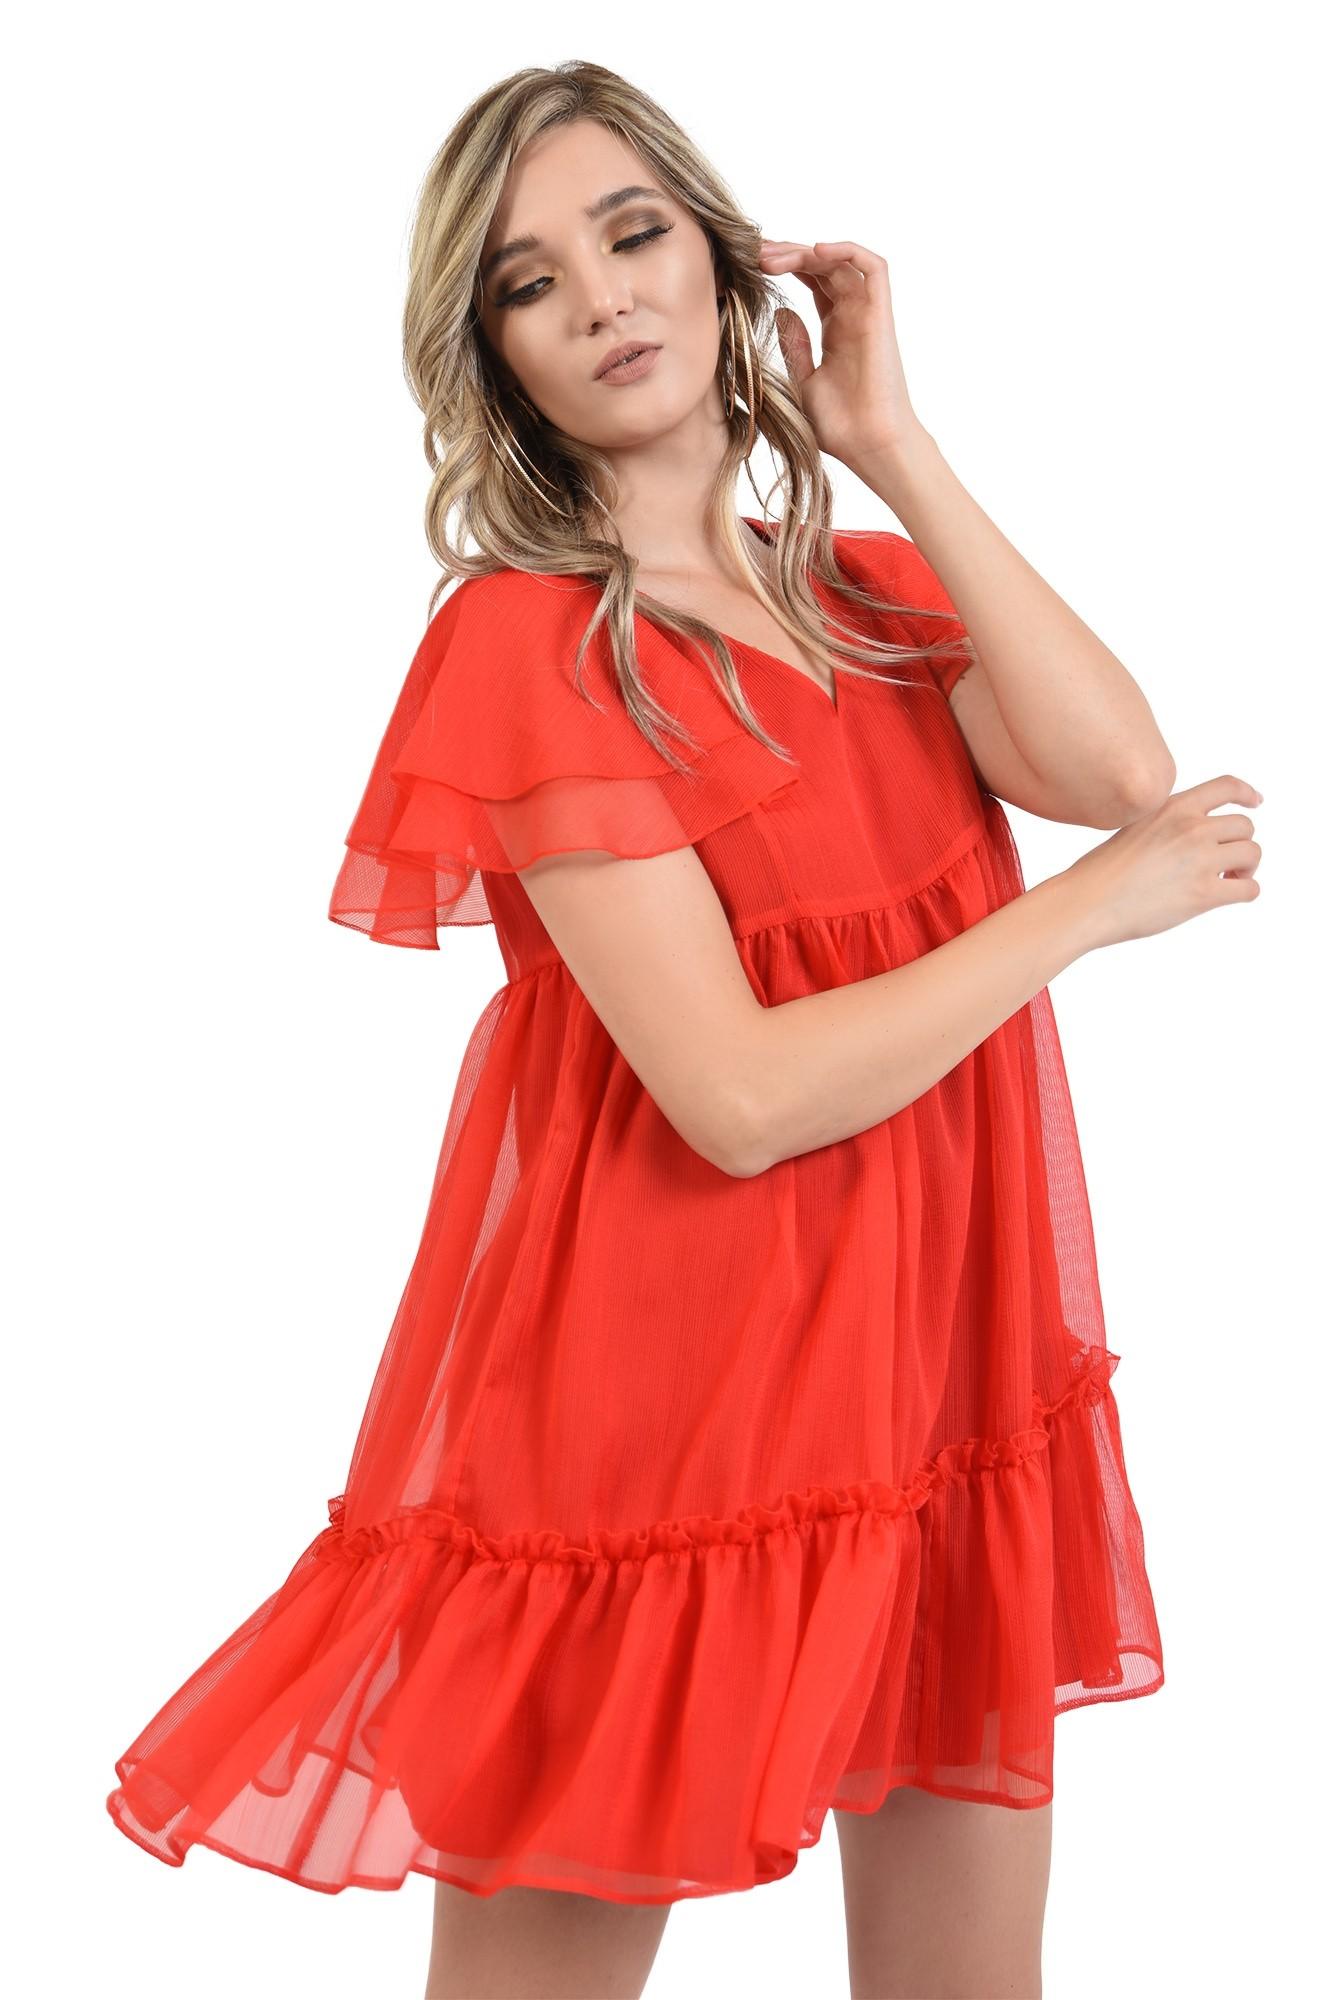 1 - 360 - rochie scurta, de vara, rosie, cu volane, Poema